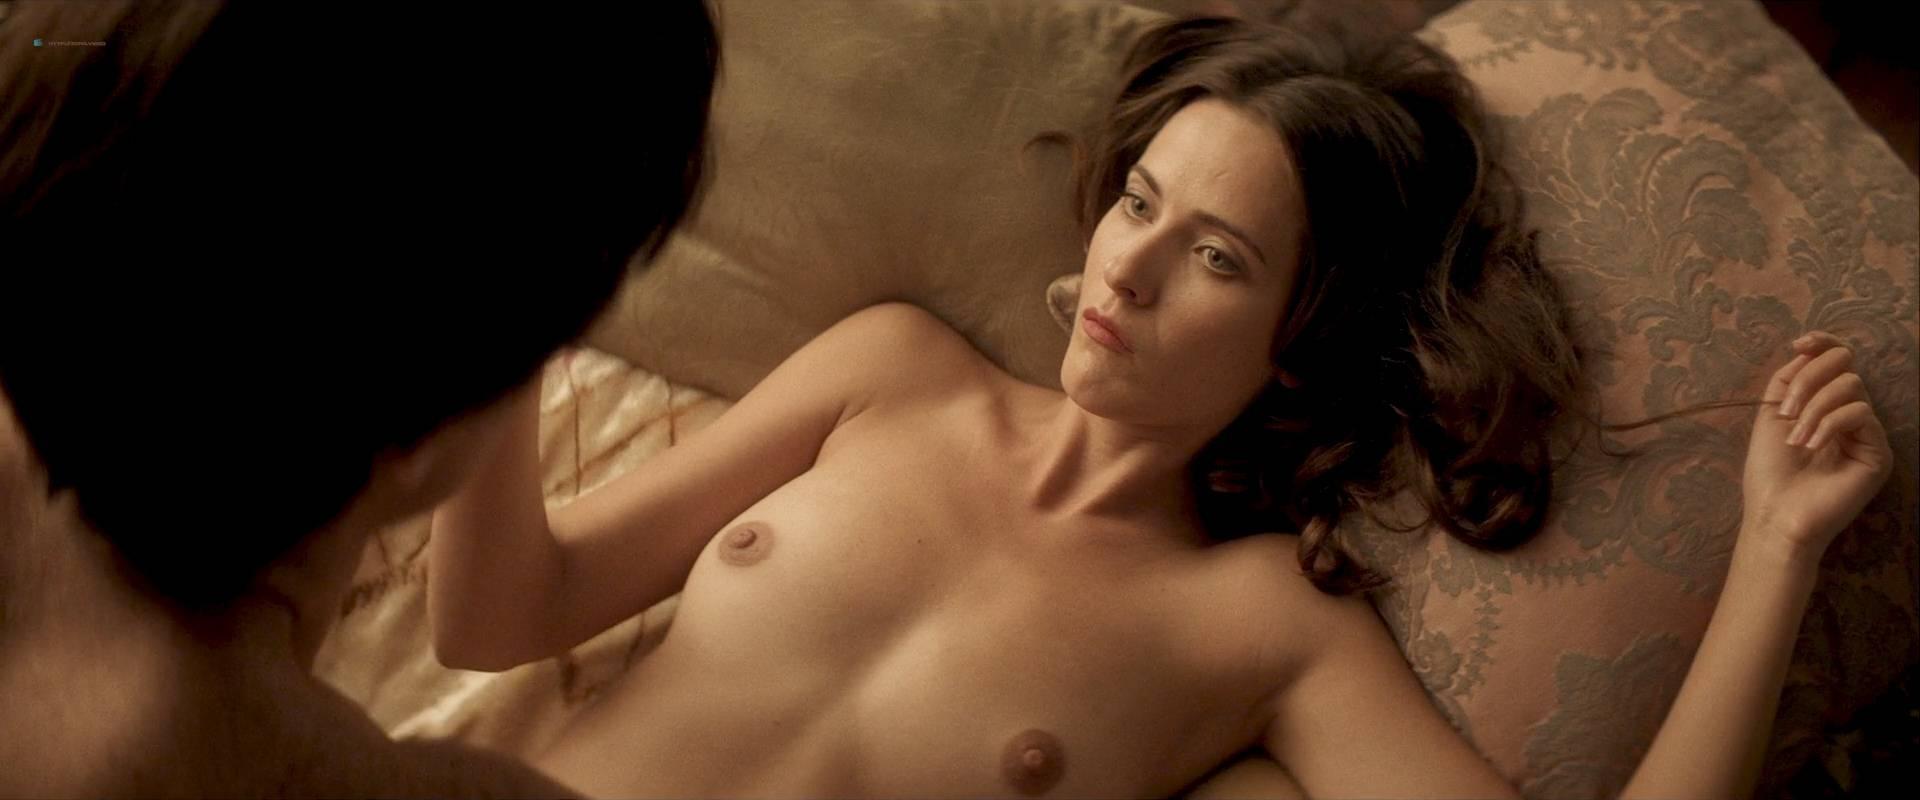 Alisa Tomei Porn sofia mattsson nude topless karina deyko nude outdoor